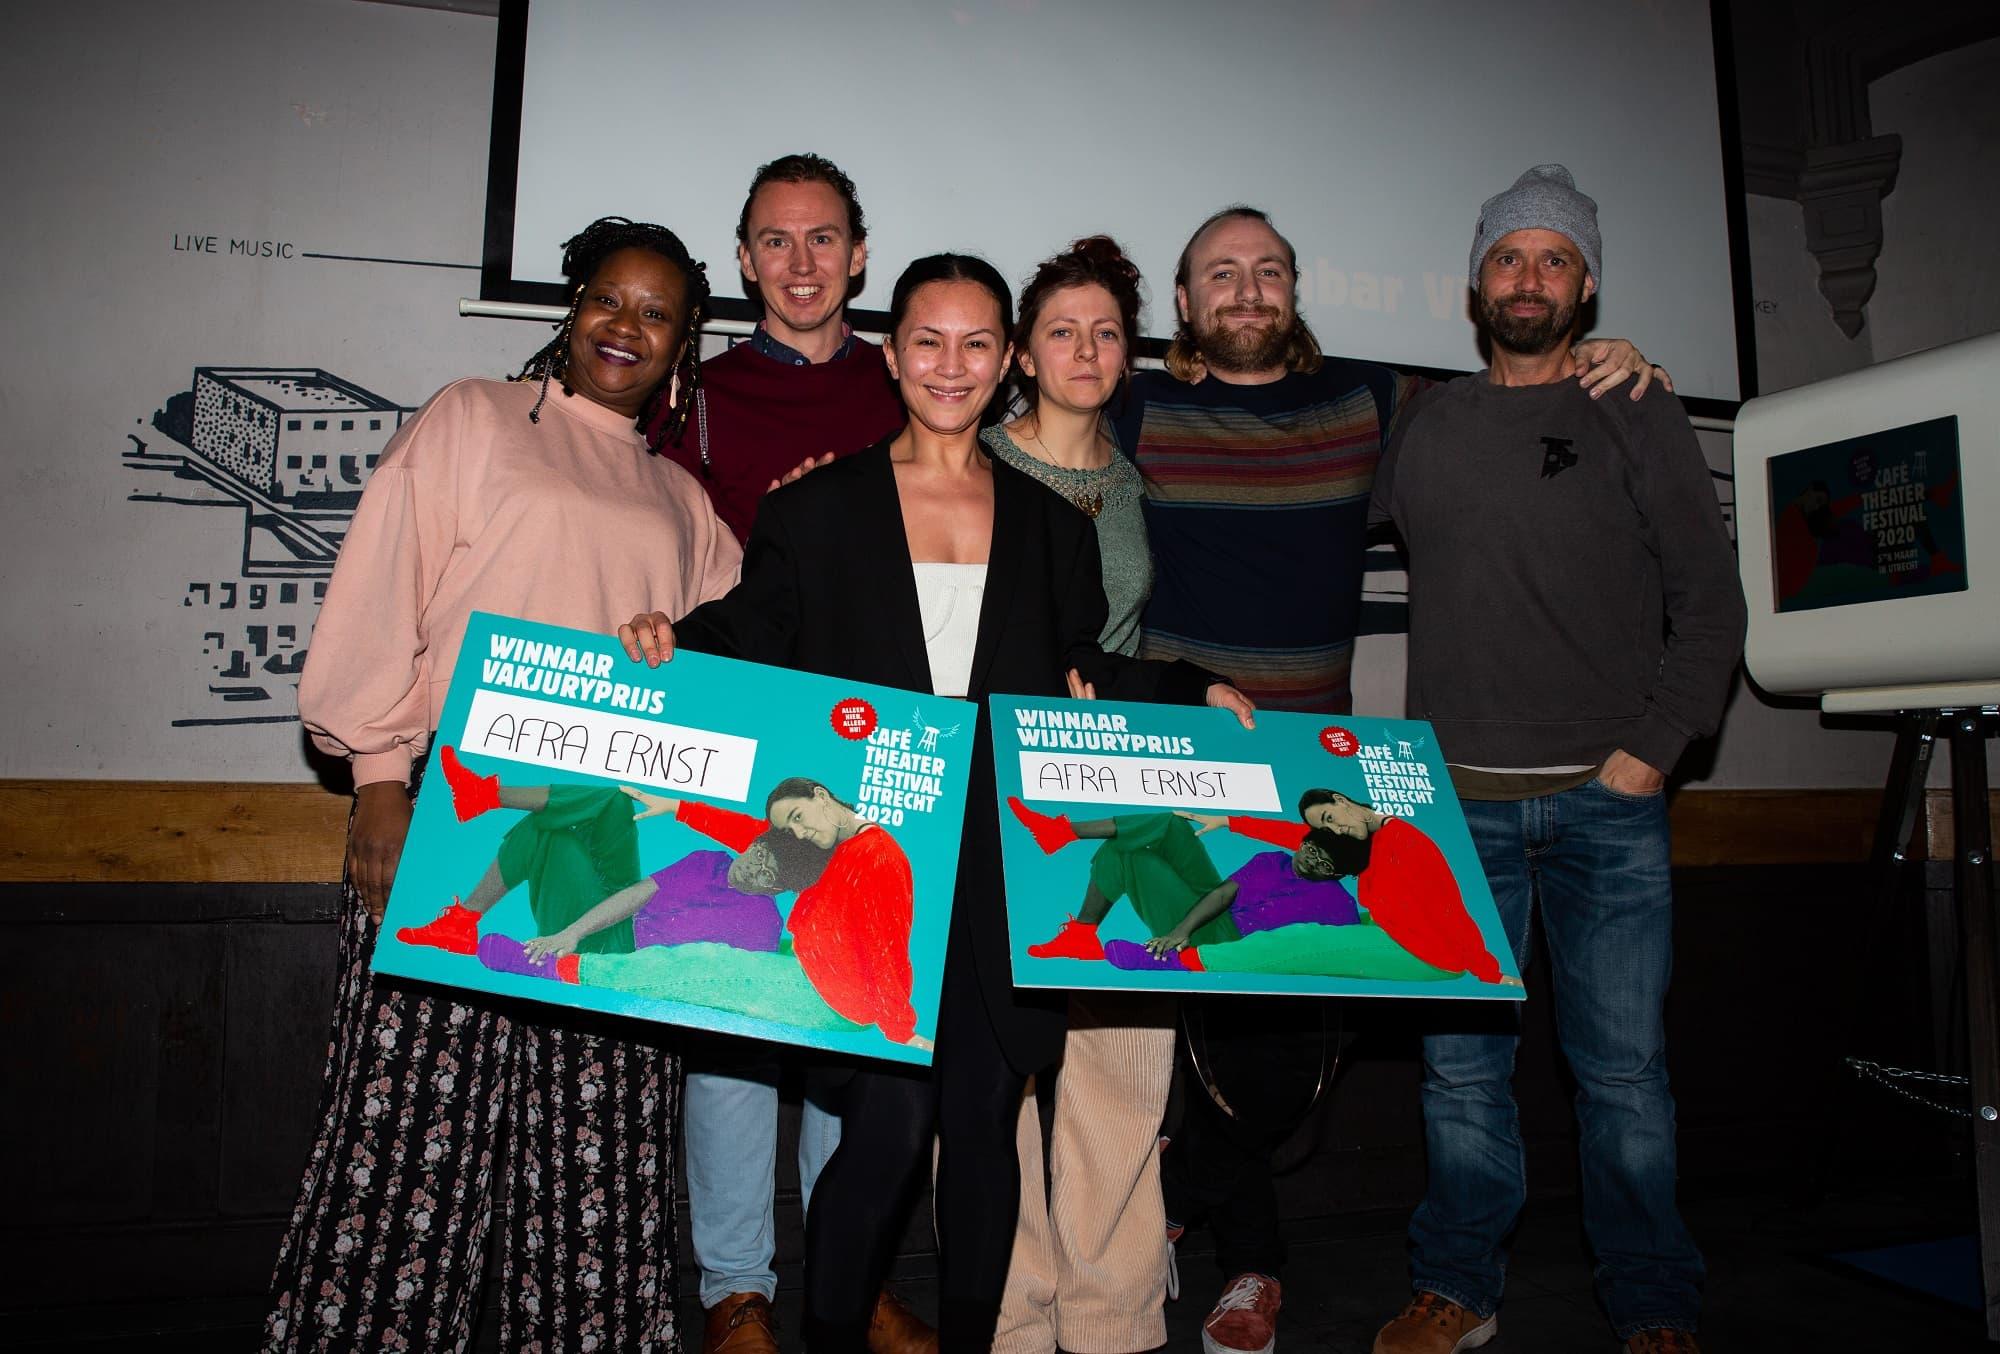 Prijswinnaars Café Theater Festival Utrecht 2020 bekend